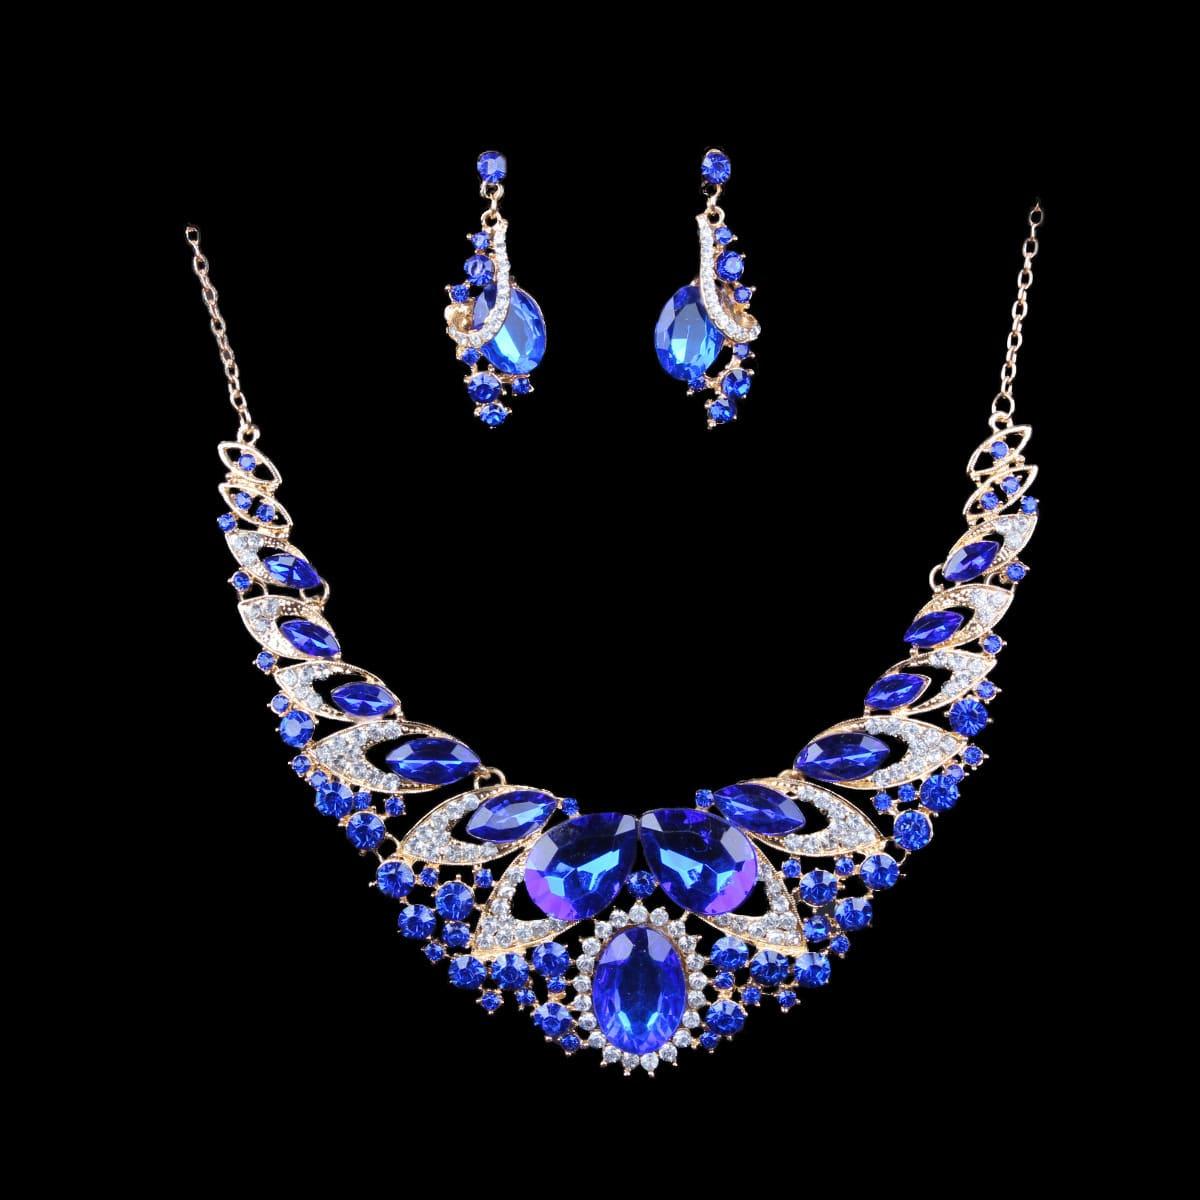 color exaggerated bride necklace set